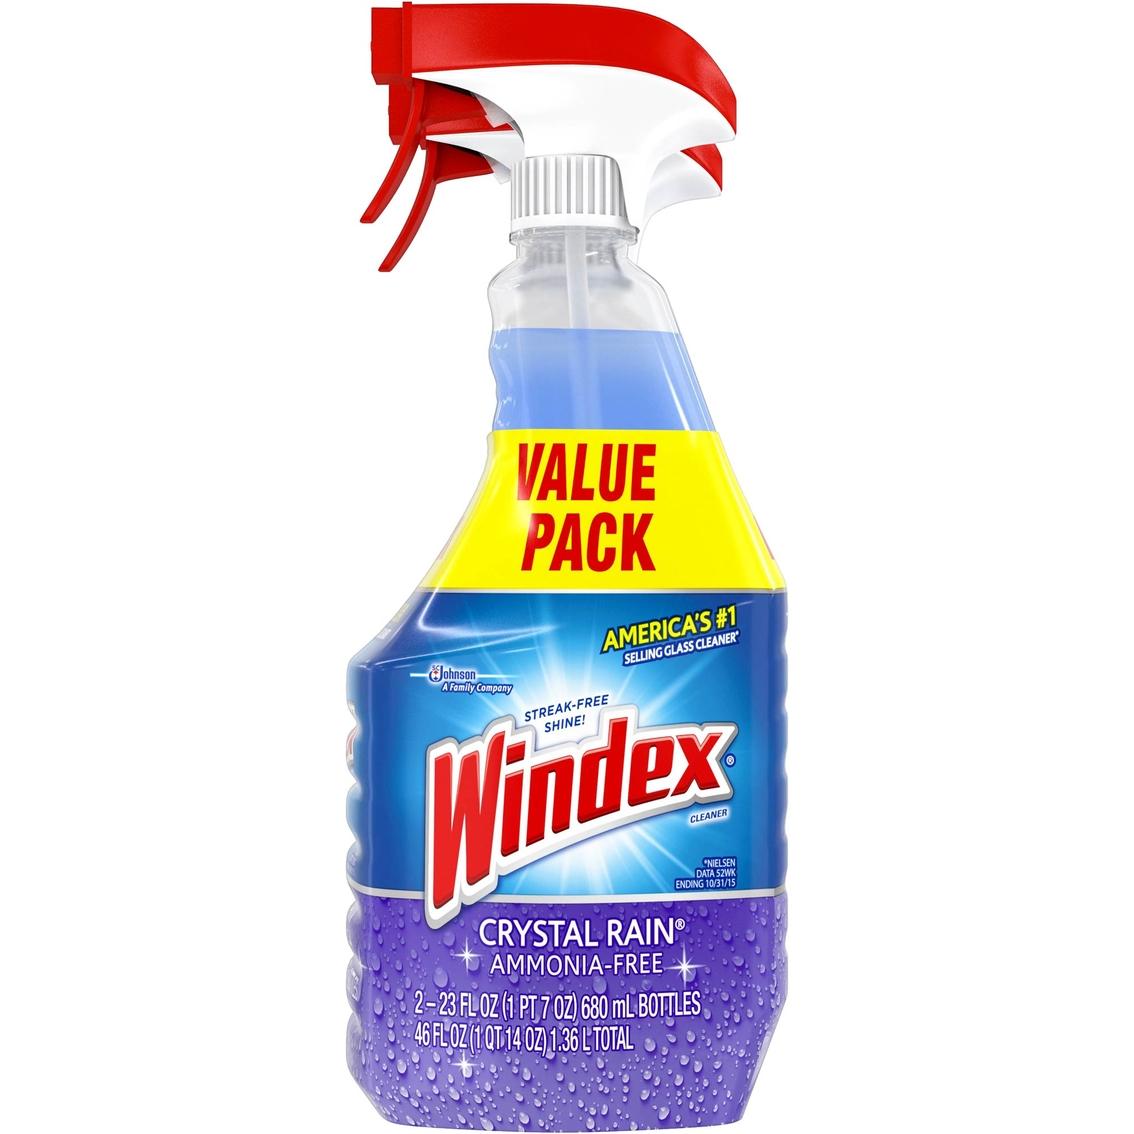 Windex Ammonia Free Crystal Rain Glass Cleaner Value Pack 2 Ct